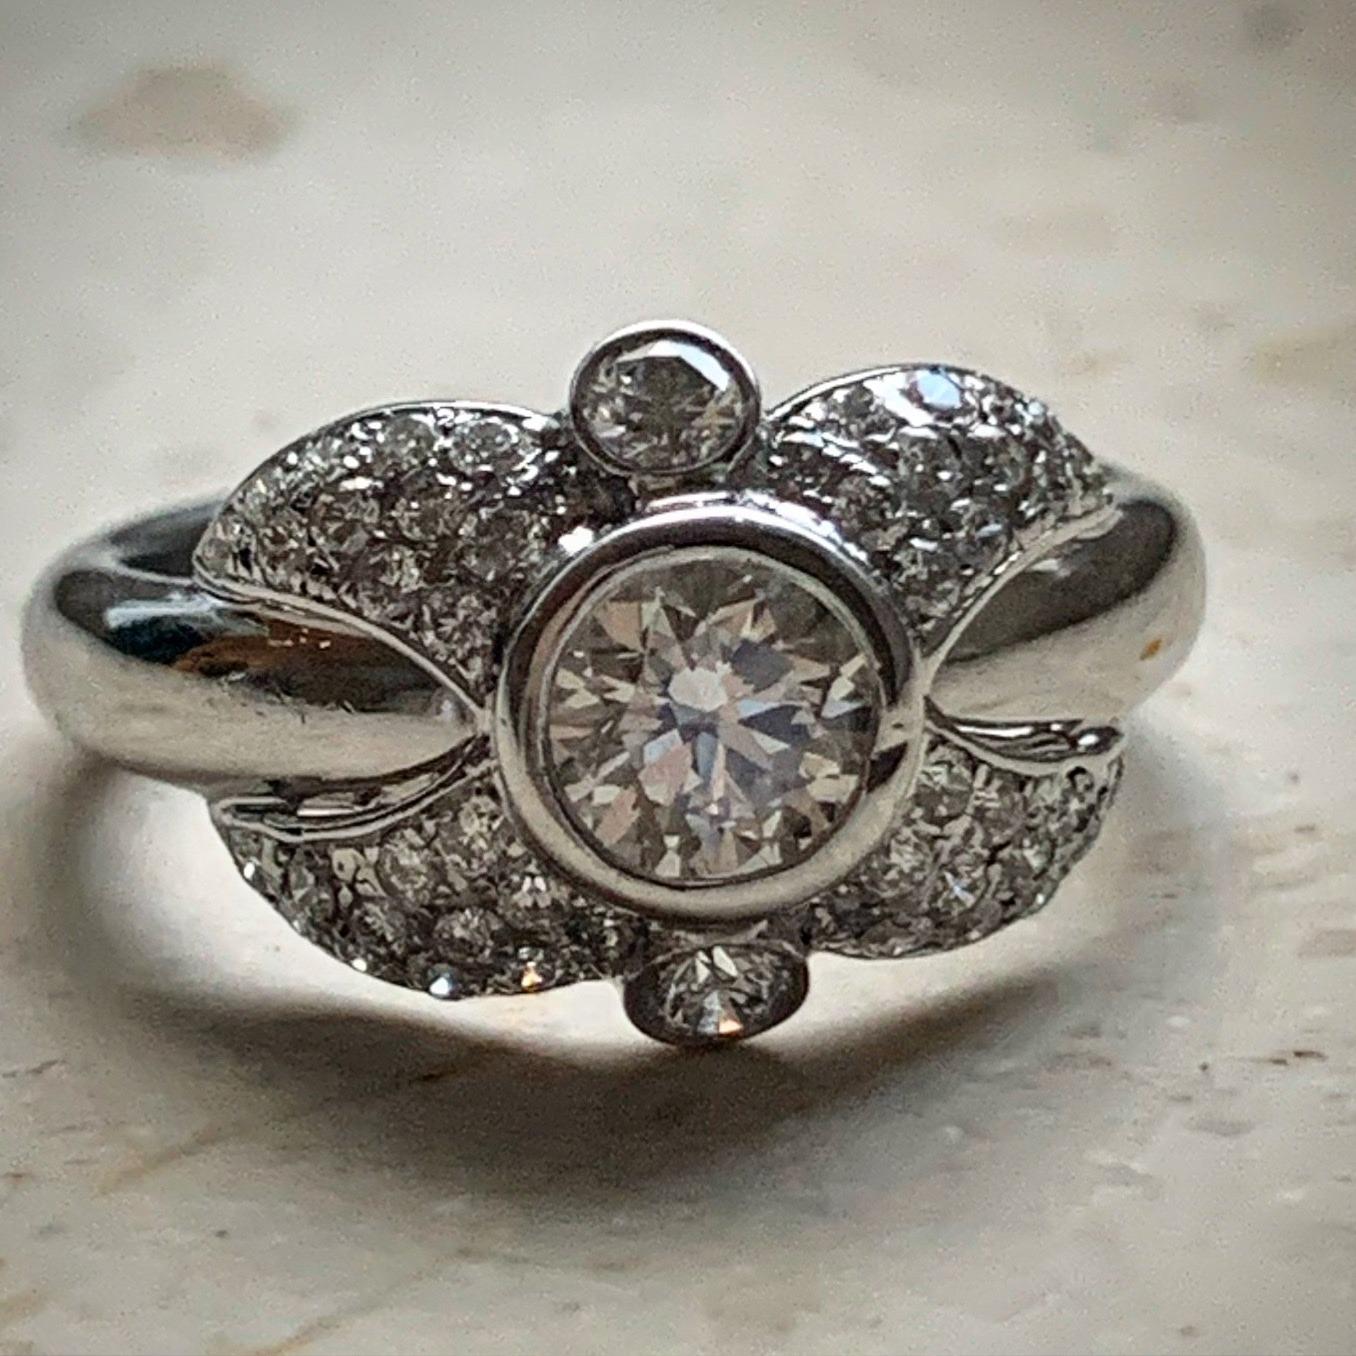 Customized diamond ring with brilliant cut diamond in center